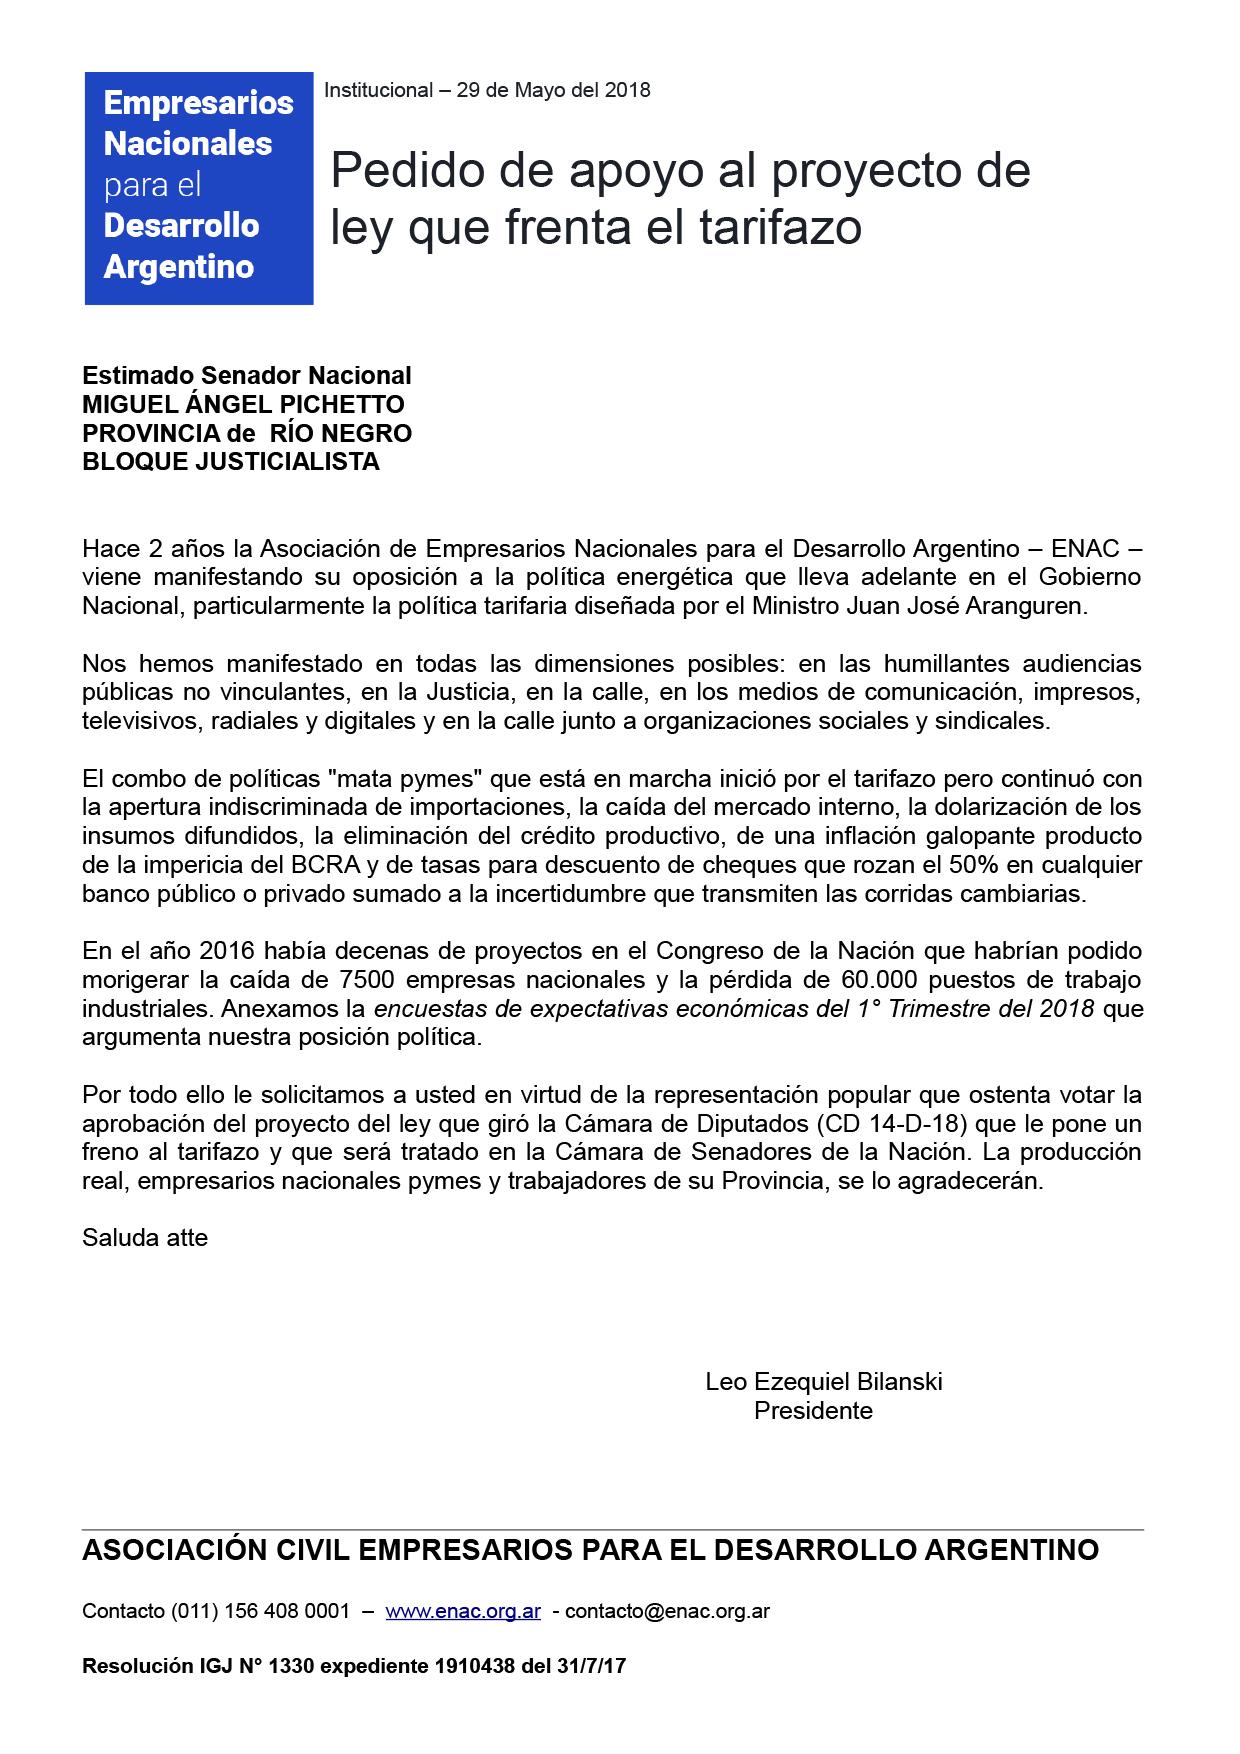 20180529 - Senadores ENAC tarifazo pichetto